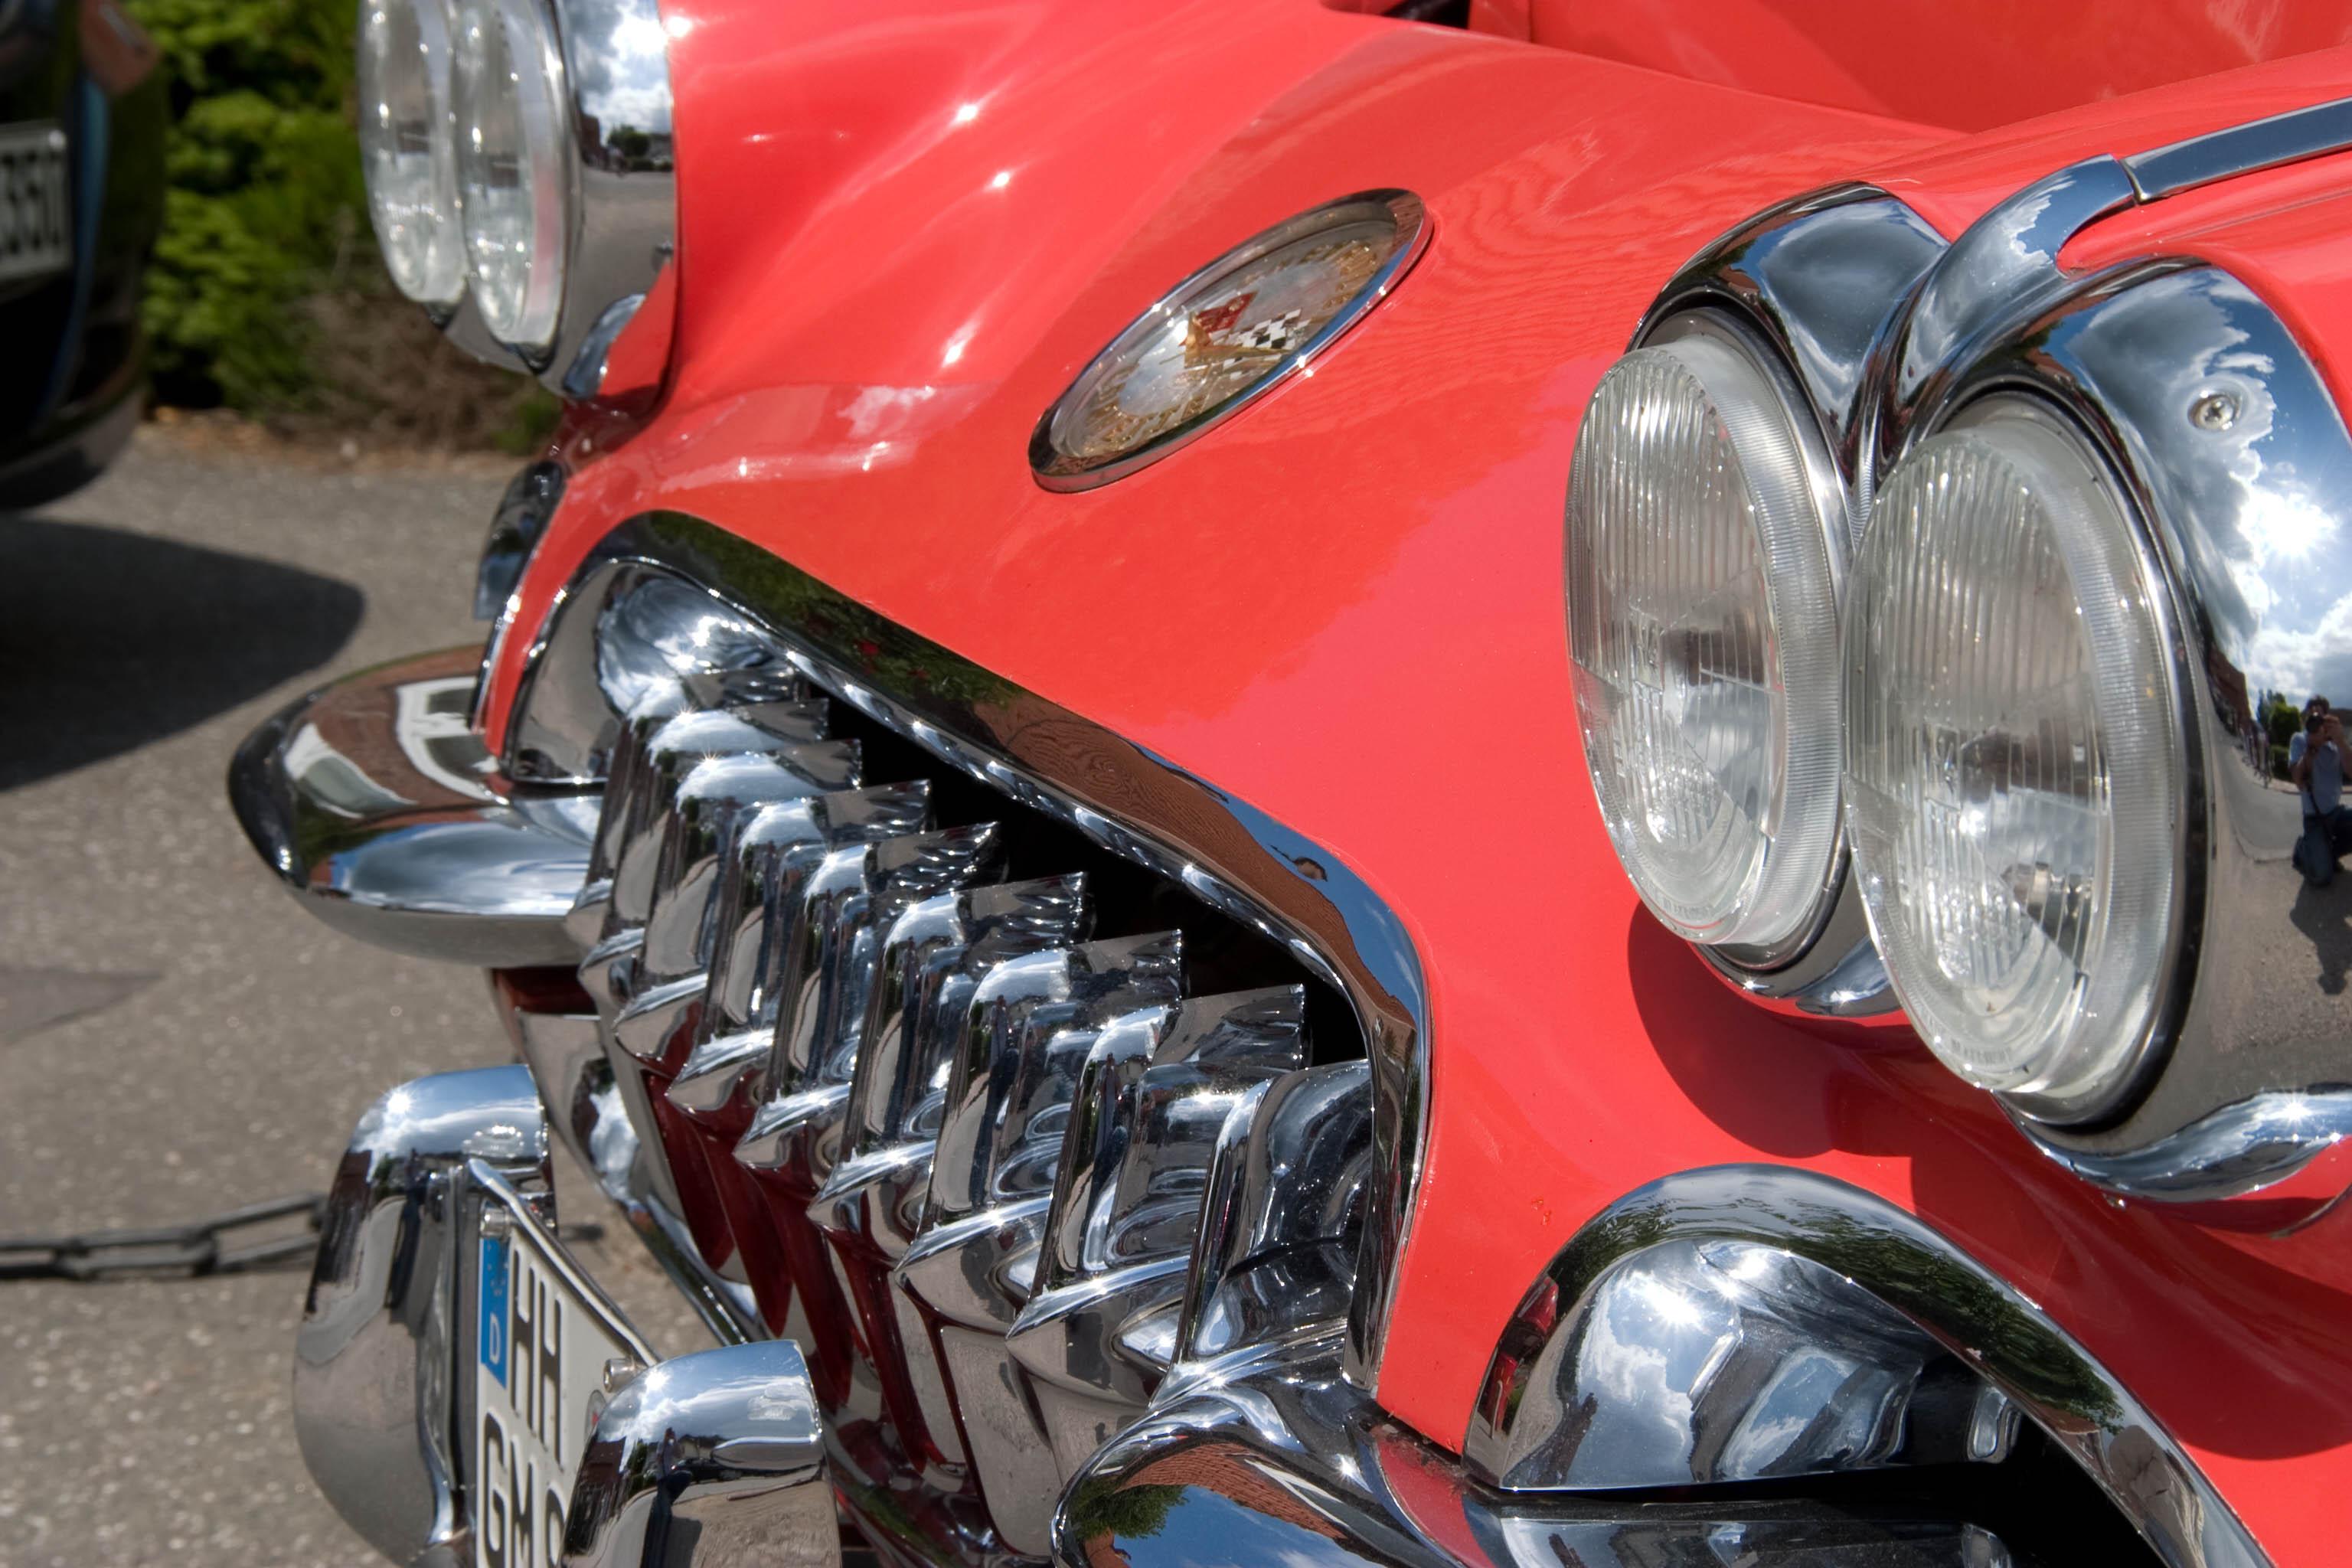 Auto, alte Corvette, Verkehrsrecht